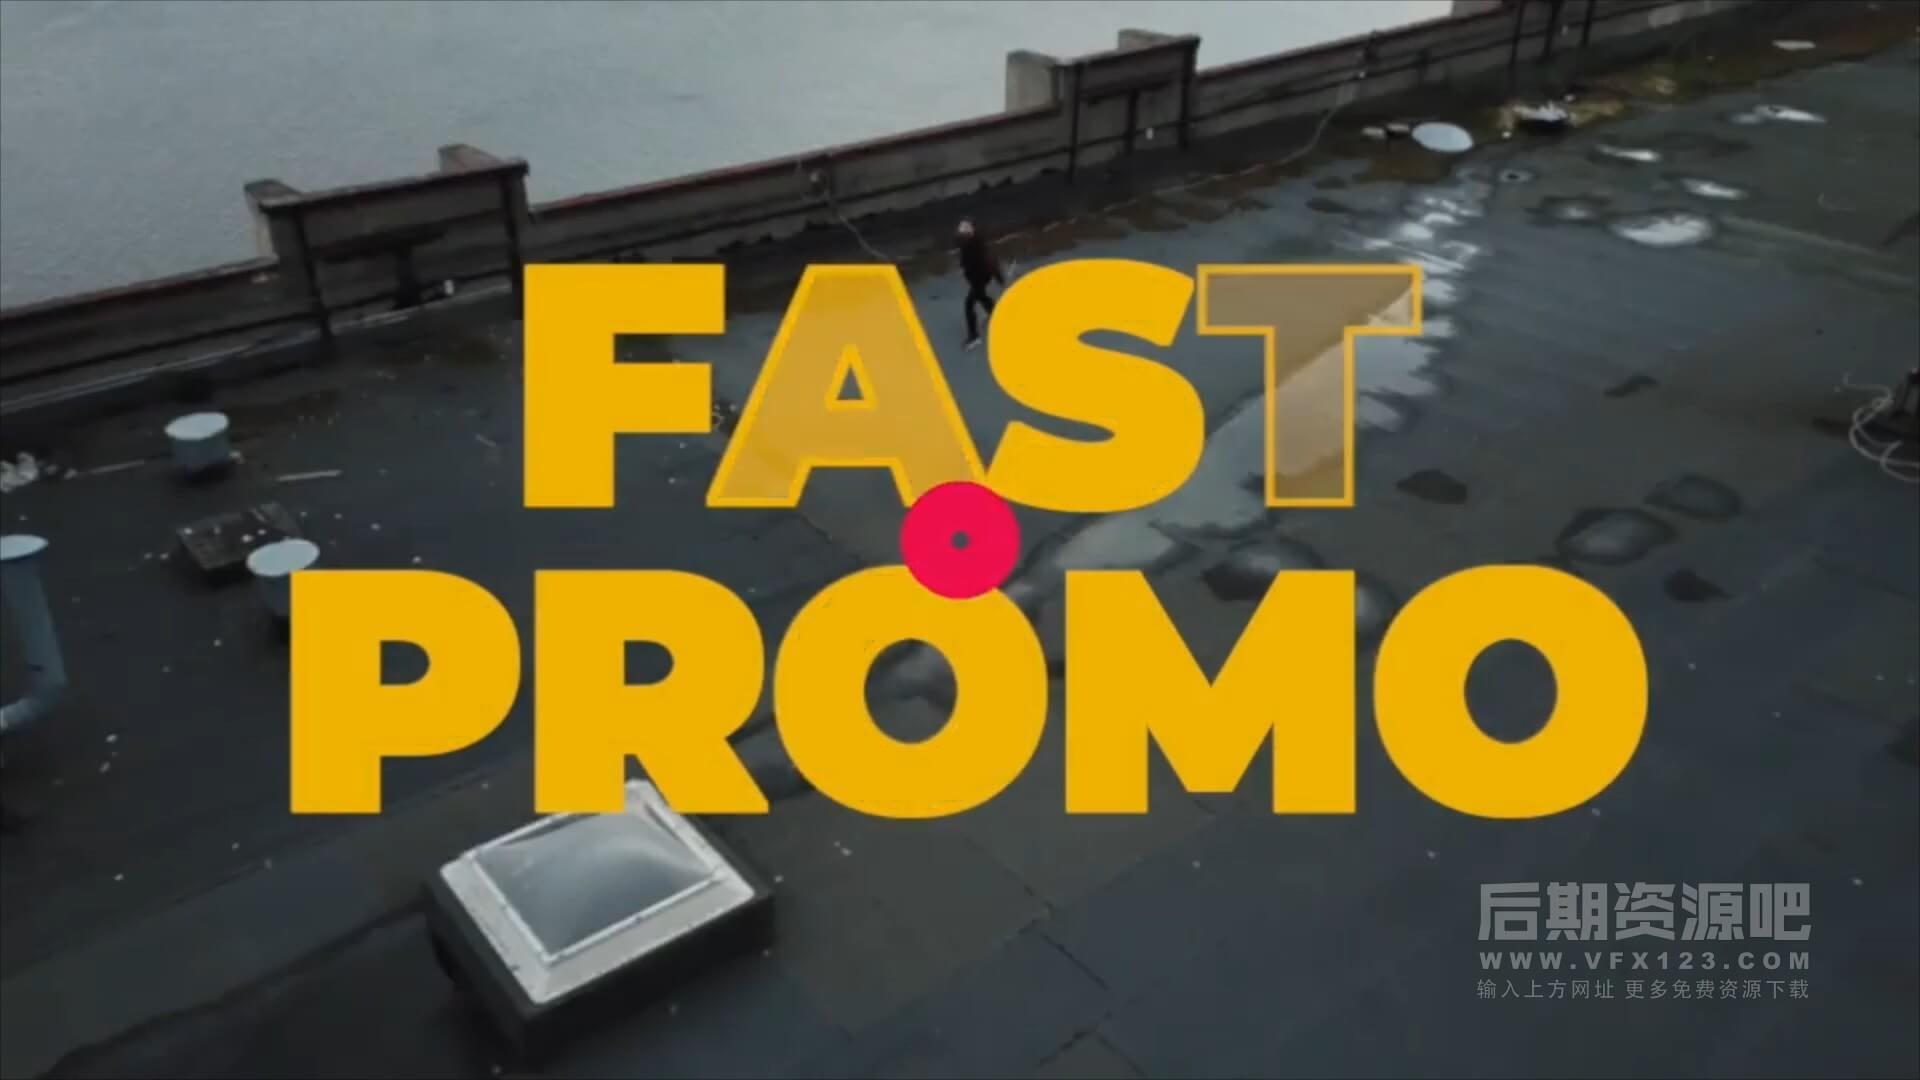 fcpx主题模板 快闪图片动画LOGO徽标展示片头 Super Fast Promo